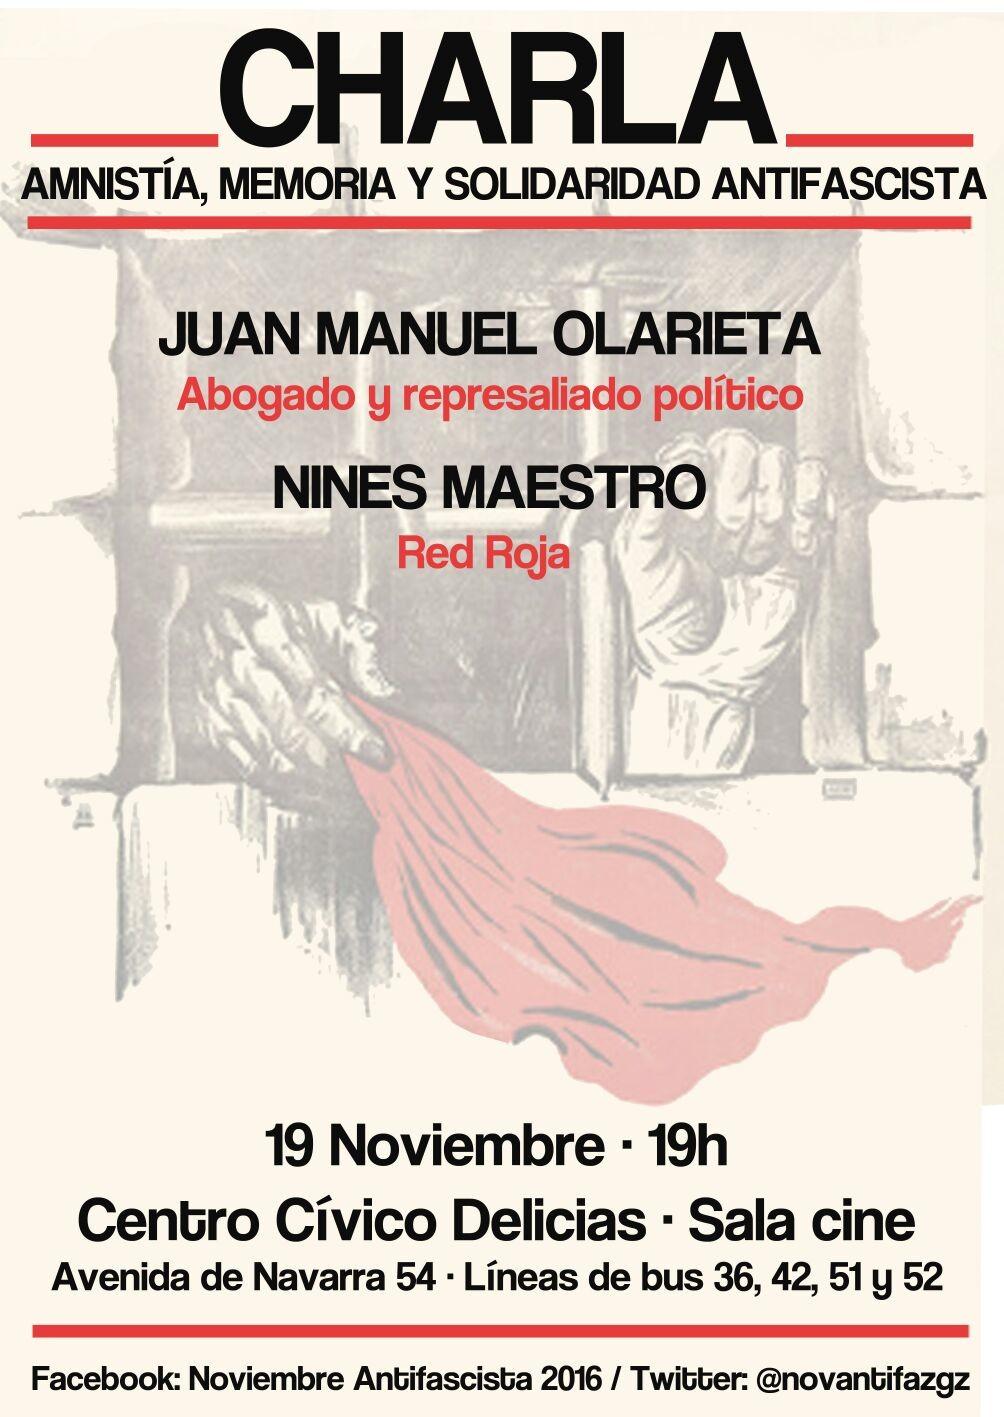 CHARLA sábado 19 de Noviembre. Amnistía, memoria y solidaridad Antifascista. Noviembre Antifascista, 2016